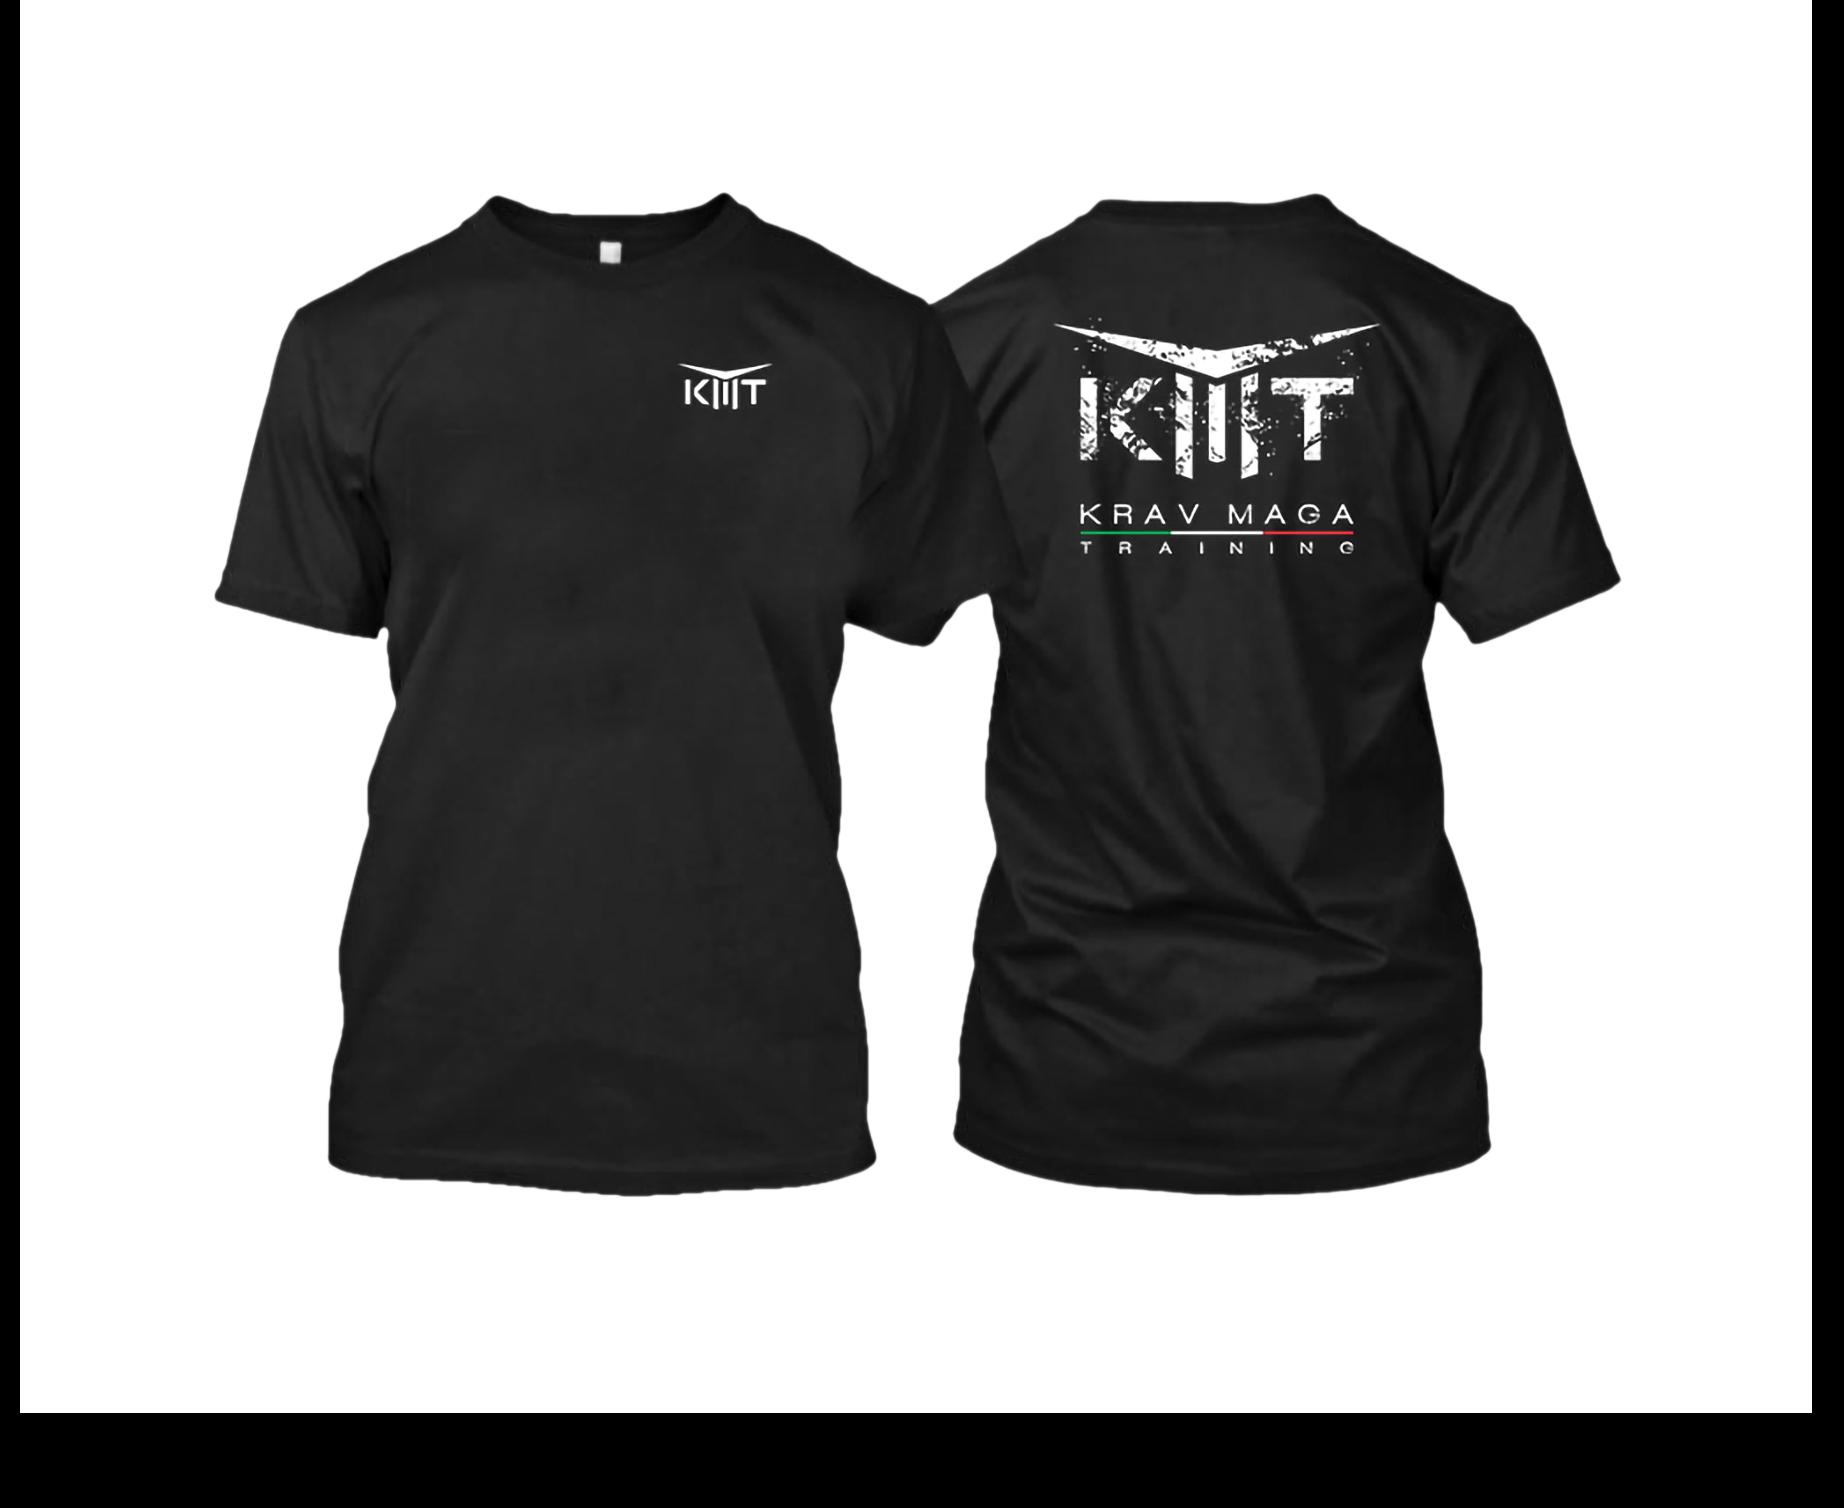 Krav Maga Training t-shirt available